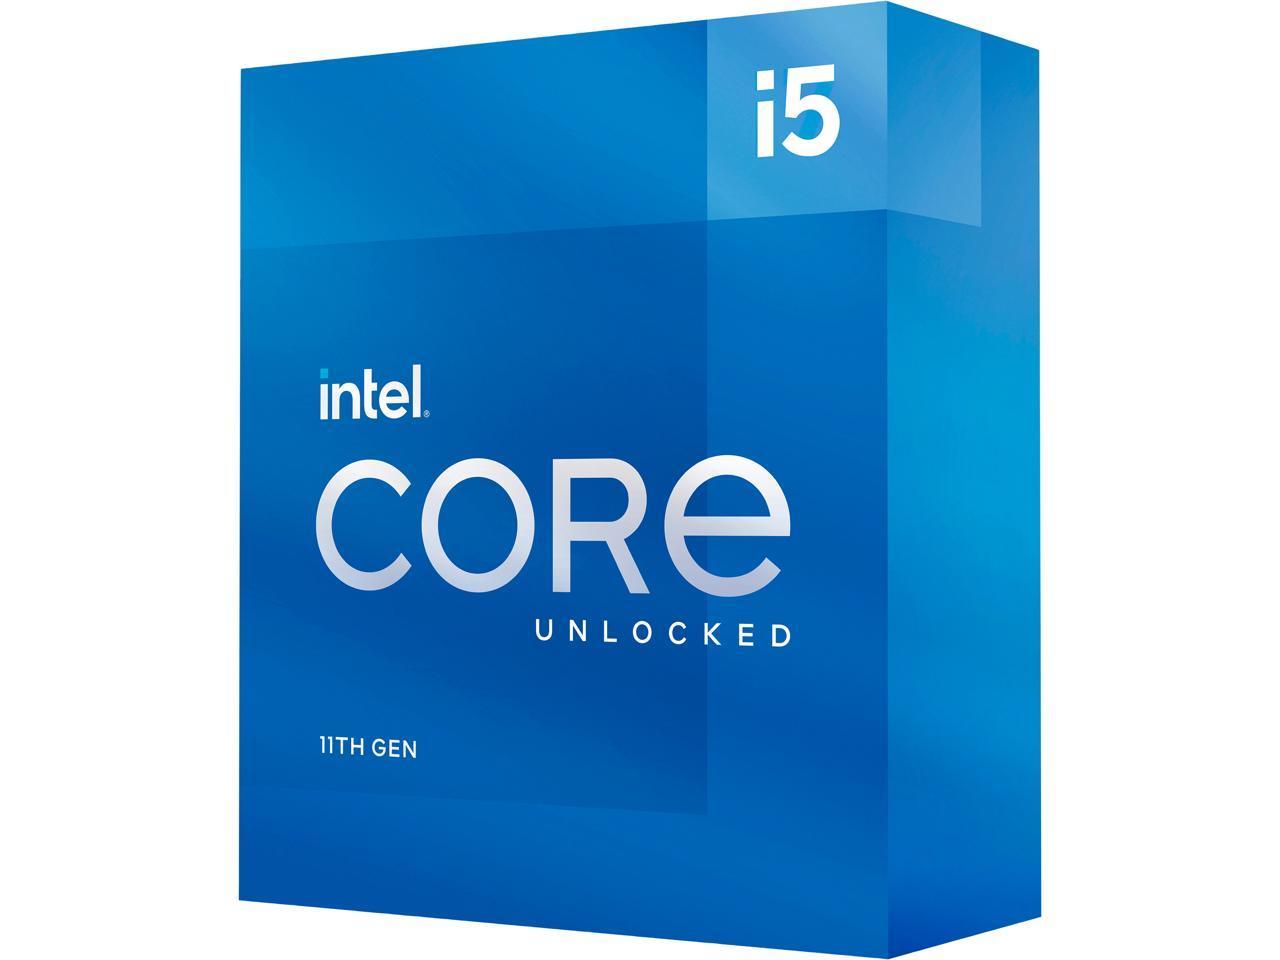 Intel Core i5-11600K Rocket Lake 6-Core 3.9 GHz LGA 1200 125W BX8070811600K Desktop Processor Intel UHD Graphics 750